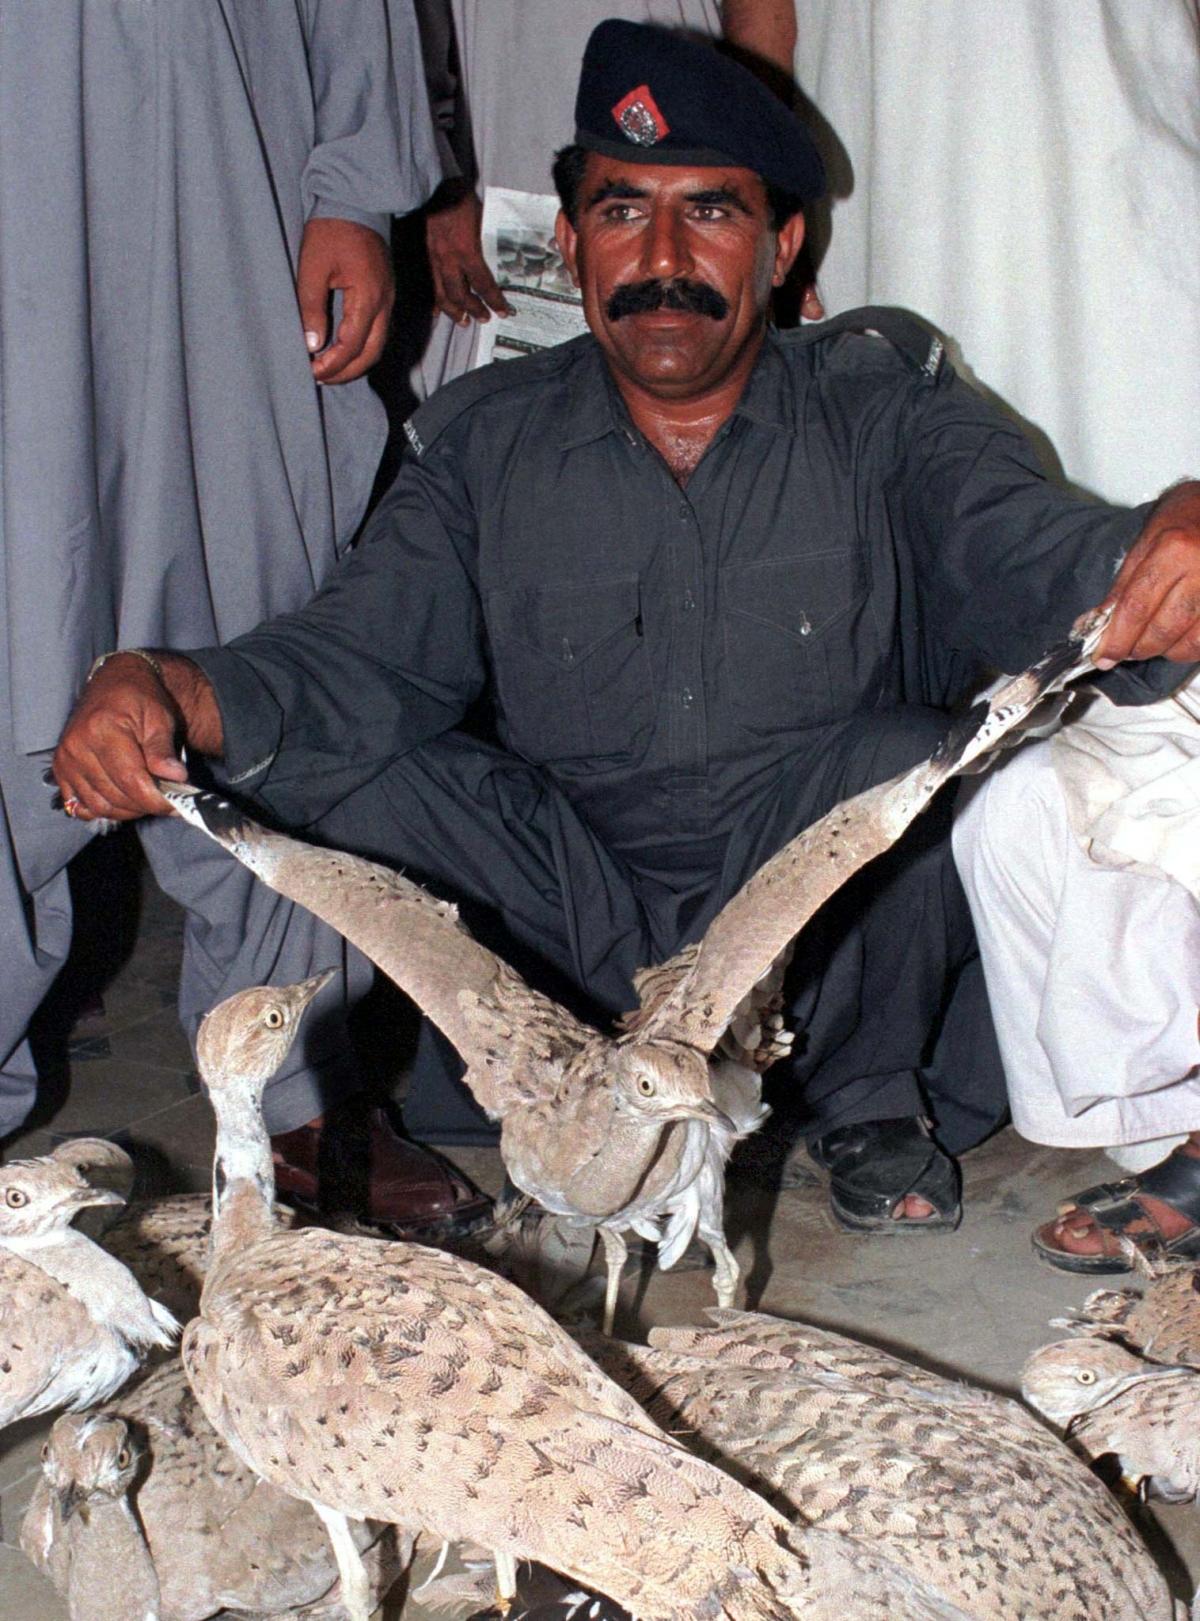 Saudi Prince Accused of Hunting 2,100 Endangered Houbara Bustards in Pakistan Safari